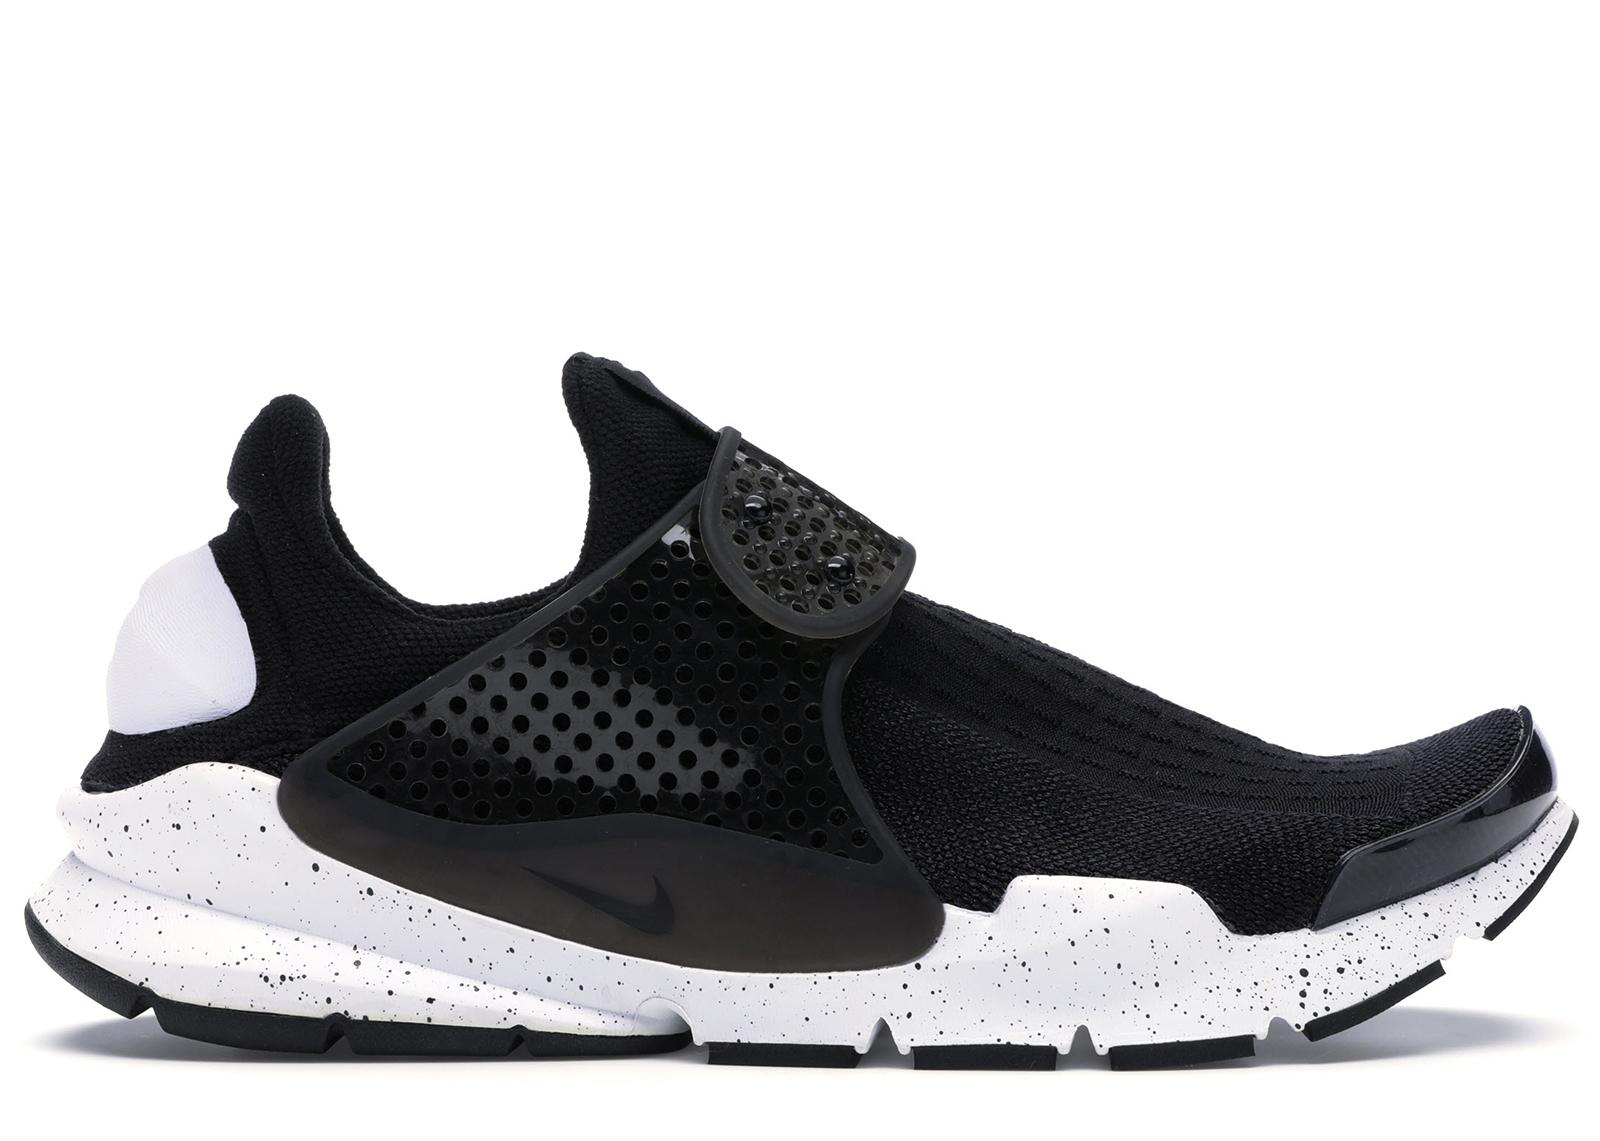 Nike Sock Dart Black White - 833124-001